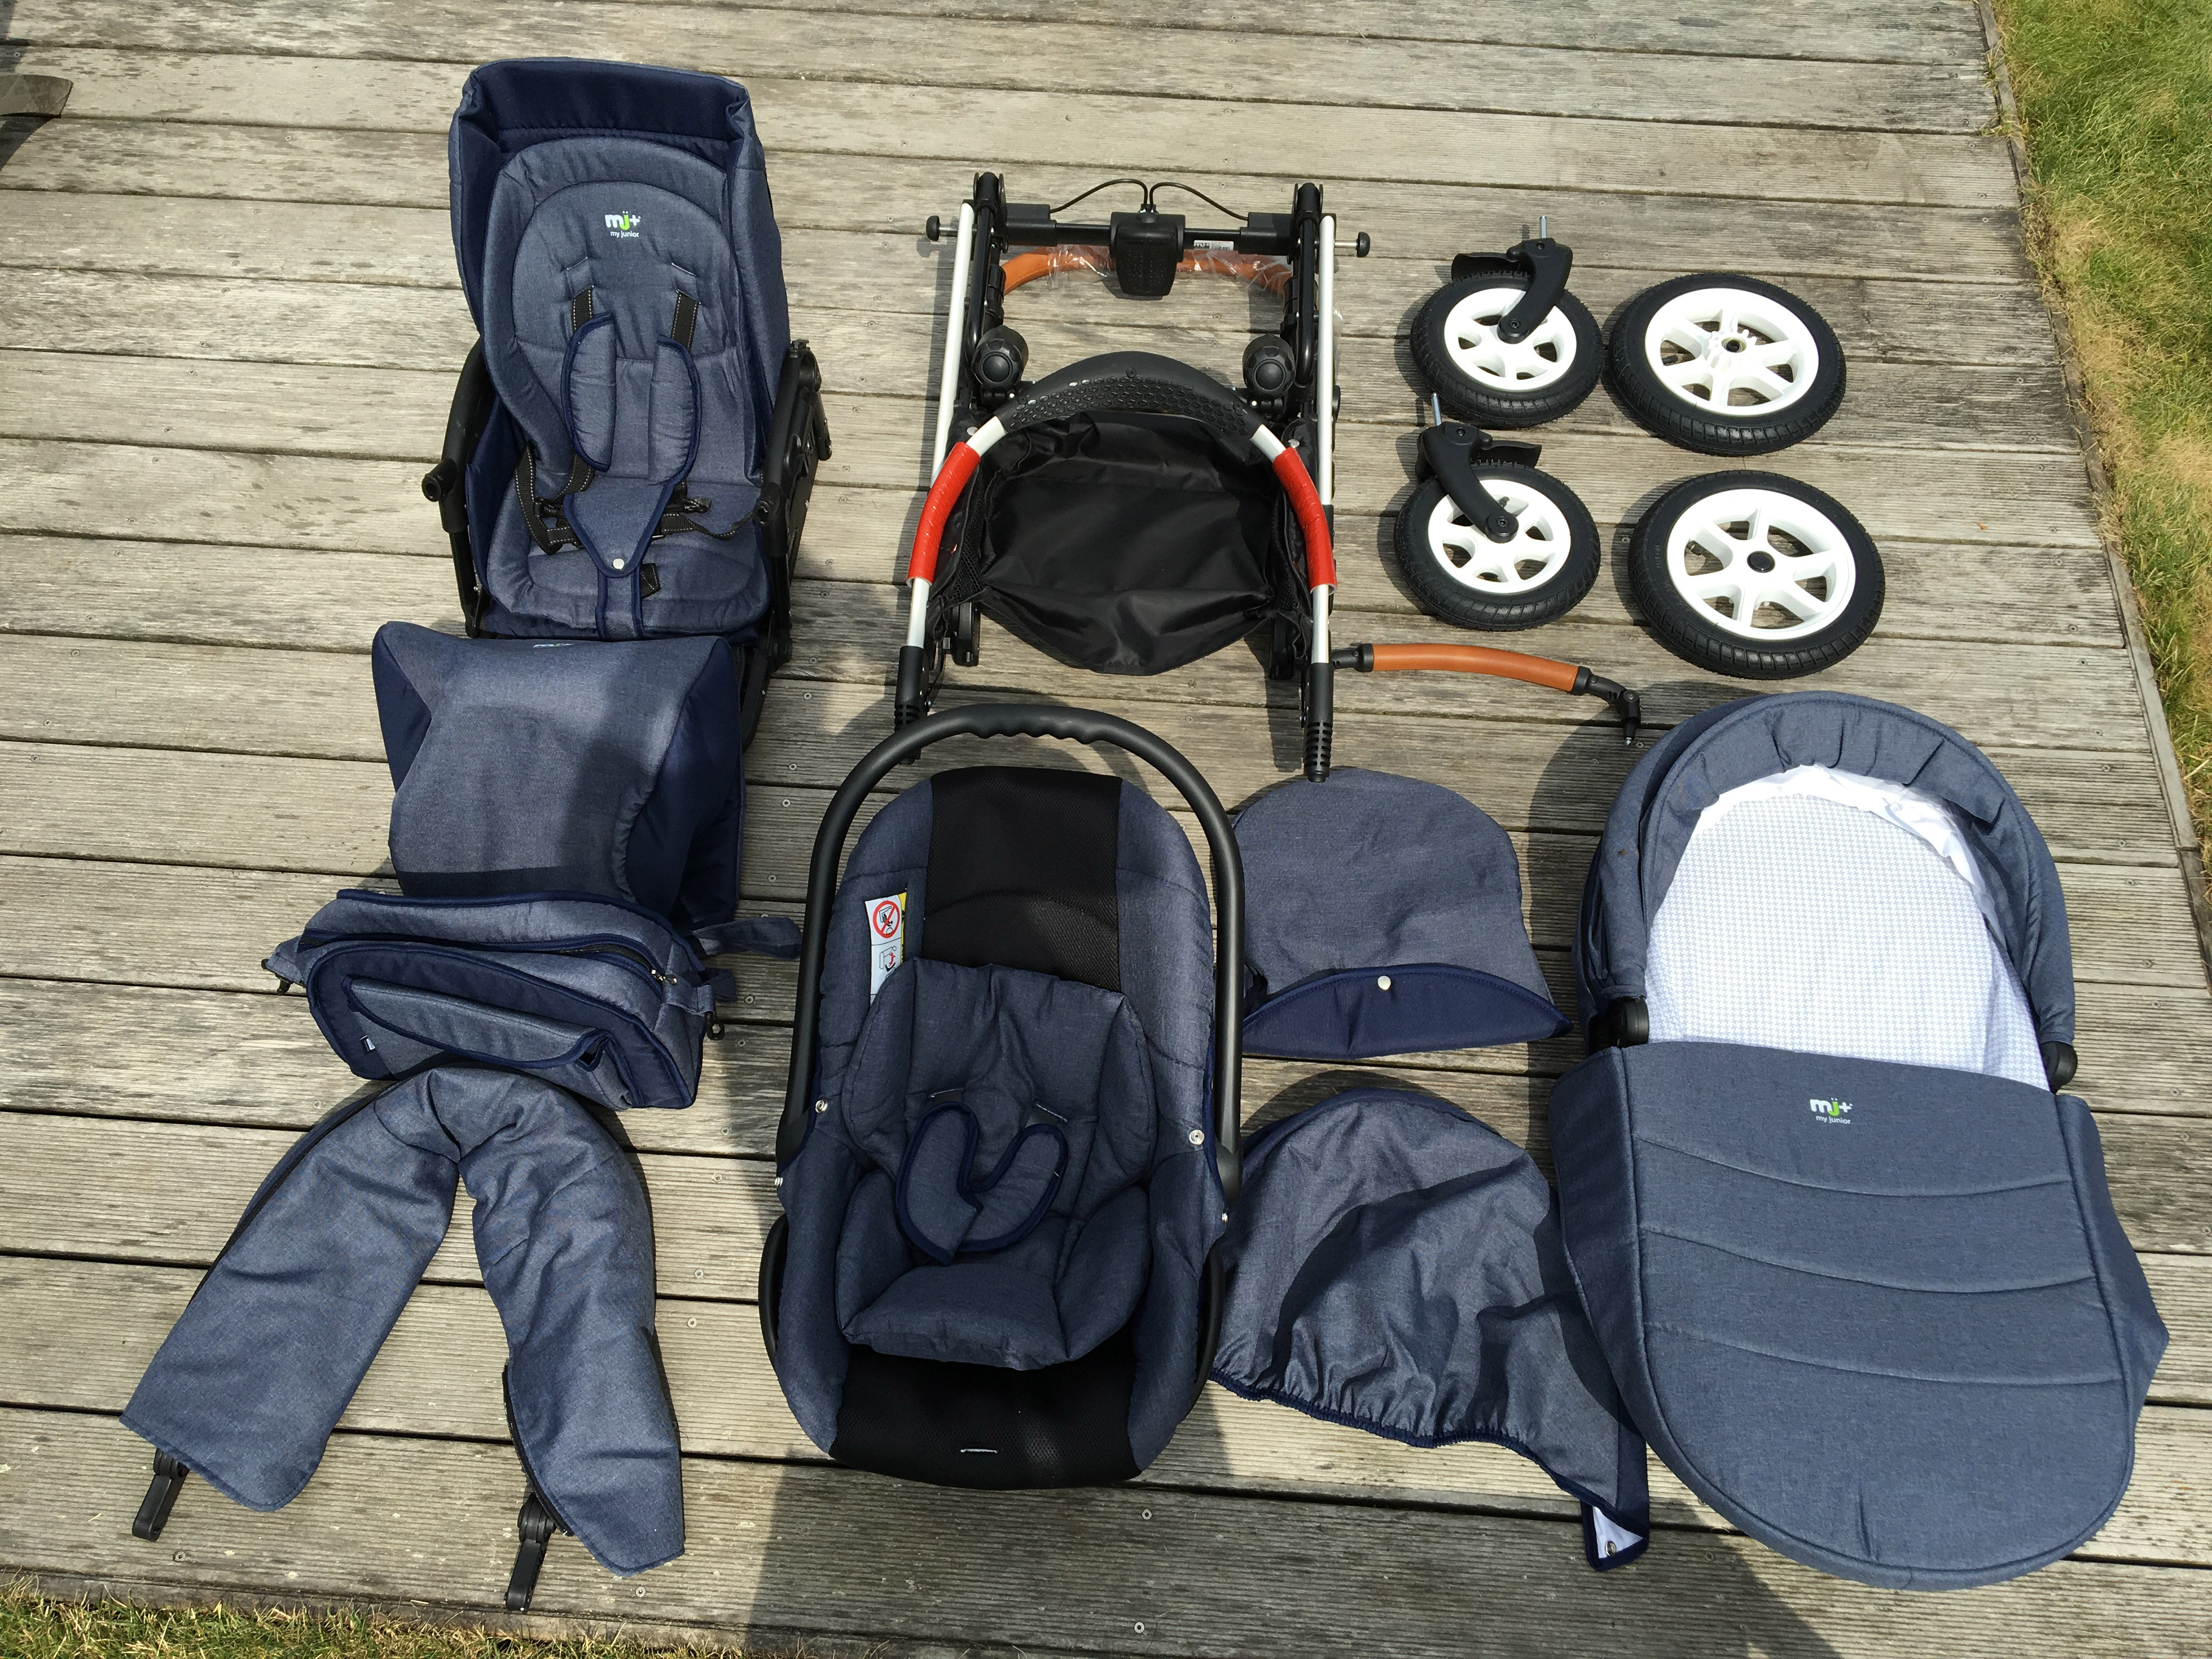 my junior miyo 3 in 1 kinderwagen. Black Bedroom Furniture Sets. Home Design Ideas